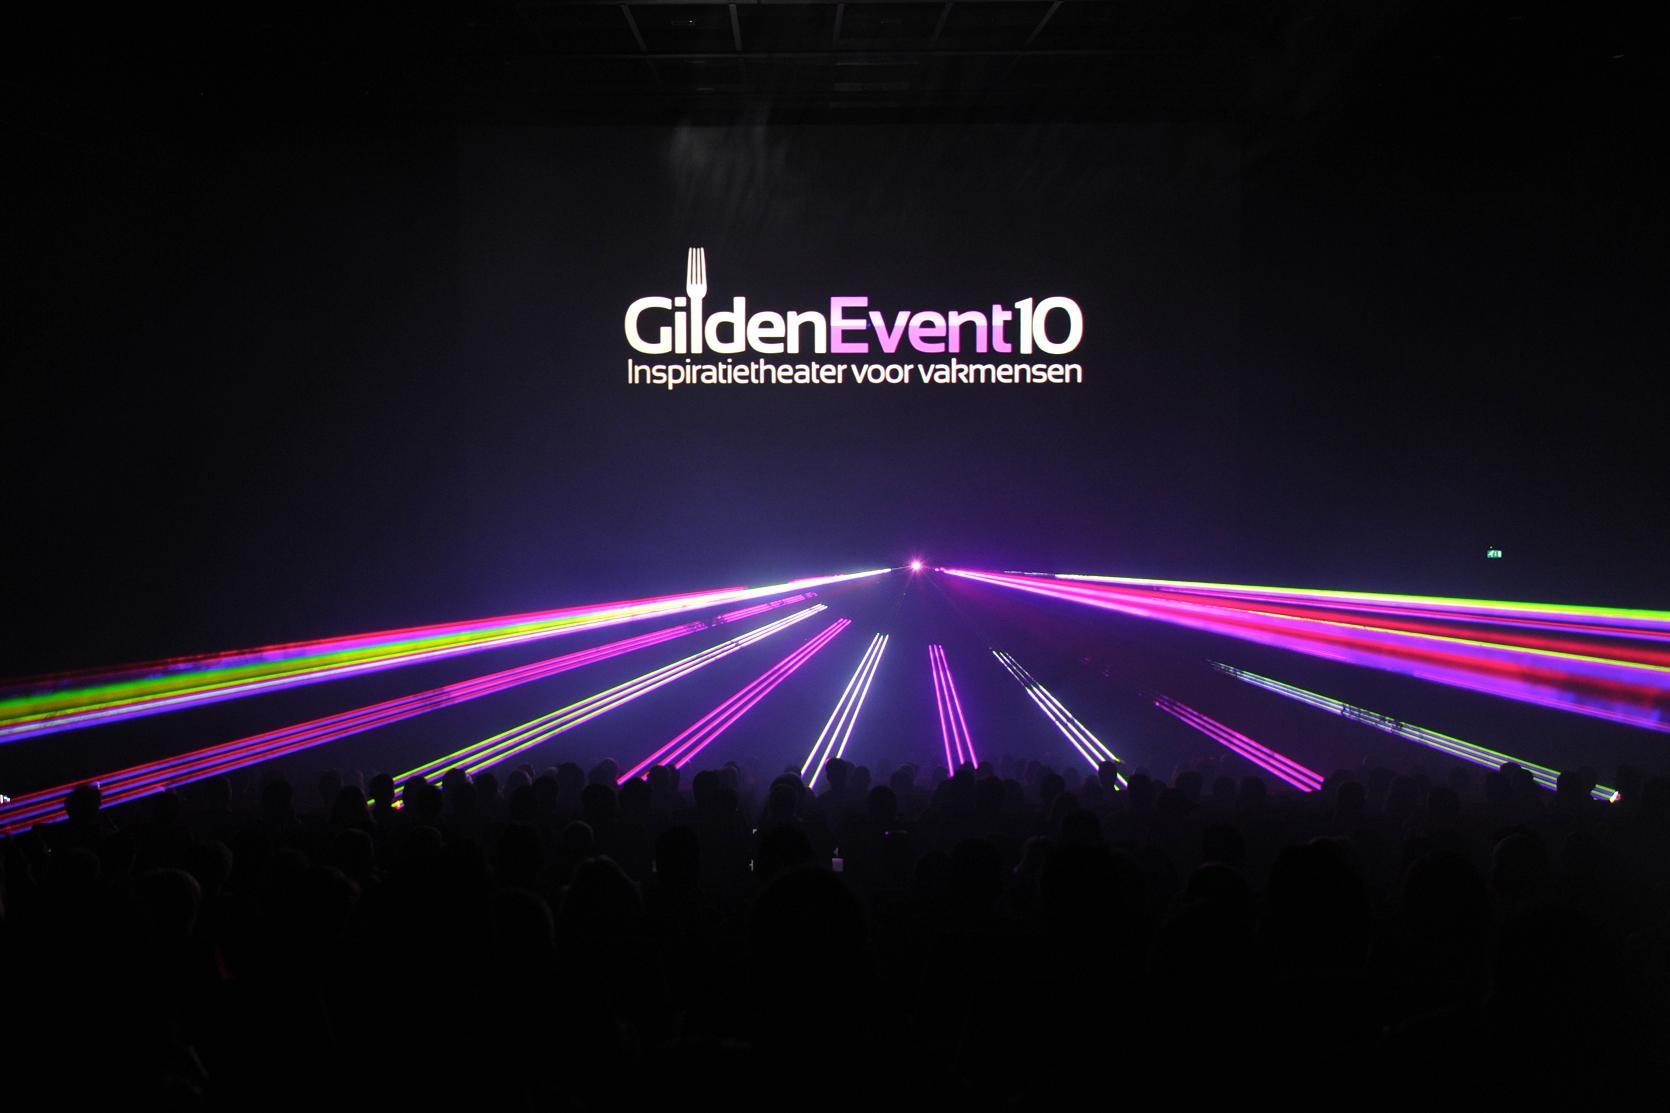 GildenEvent